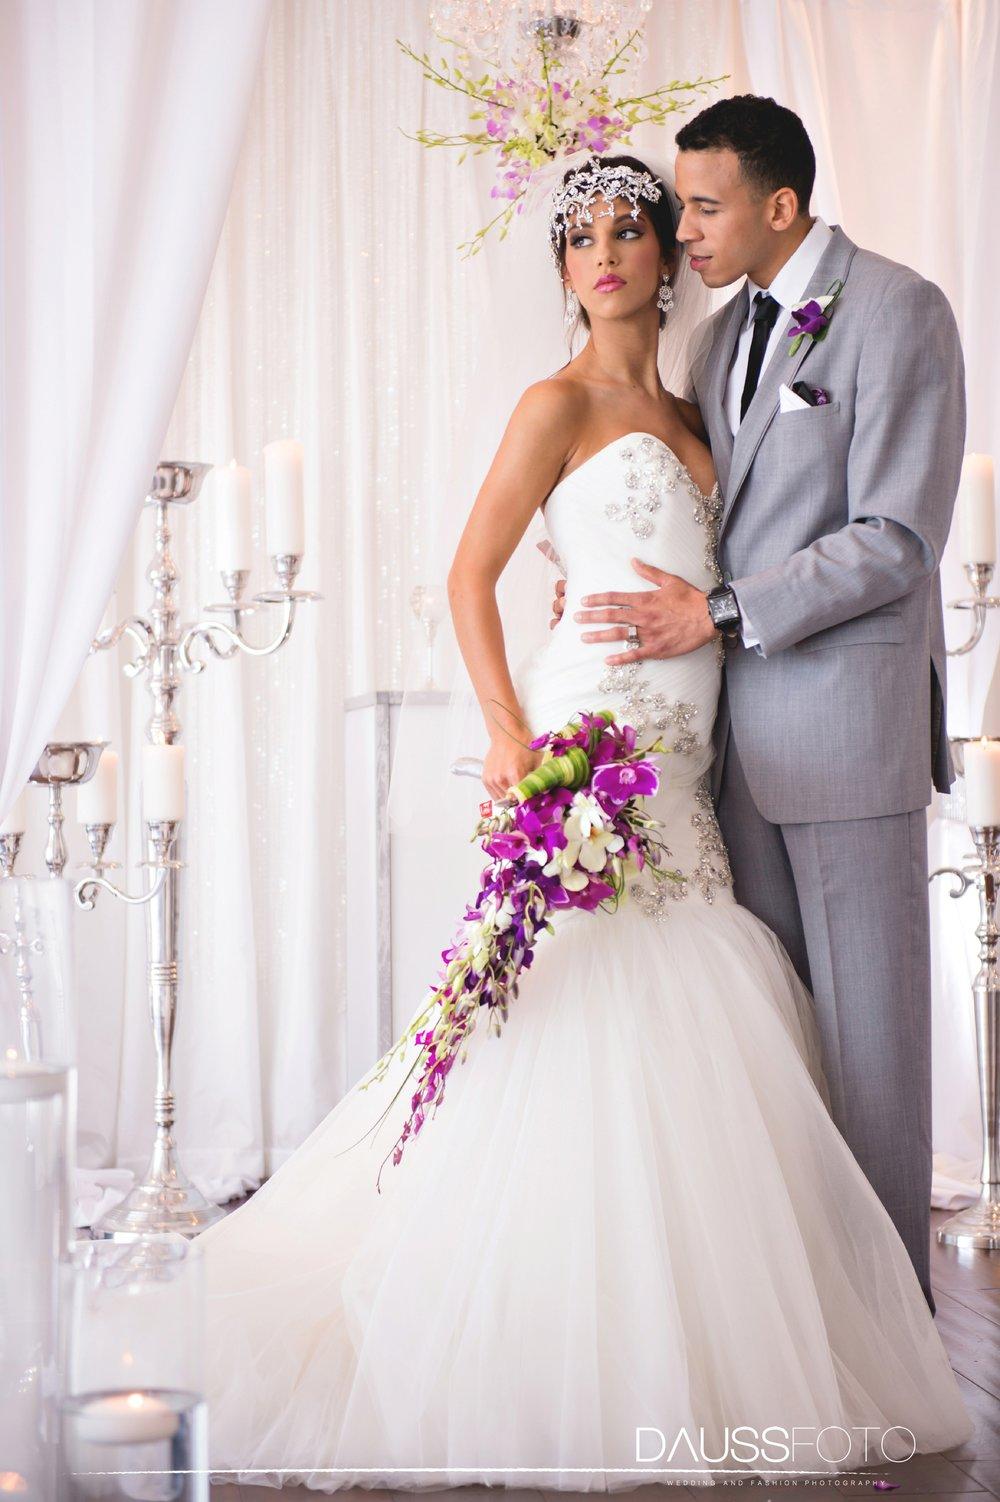 DaussFOTO_20150721_045_Indiana Wedding Photographer.jpg